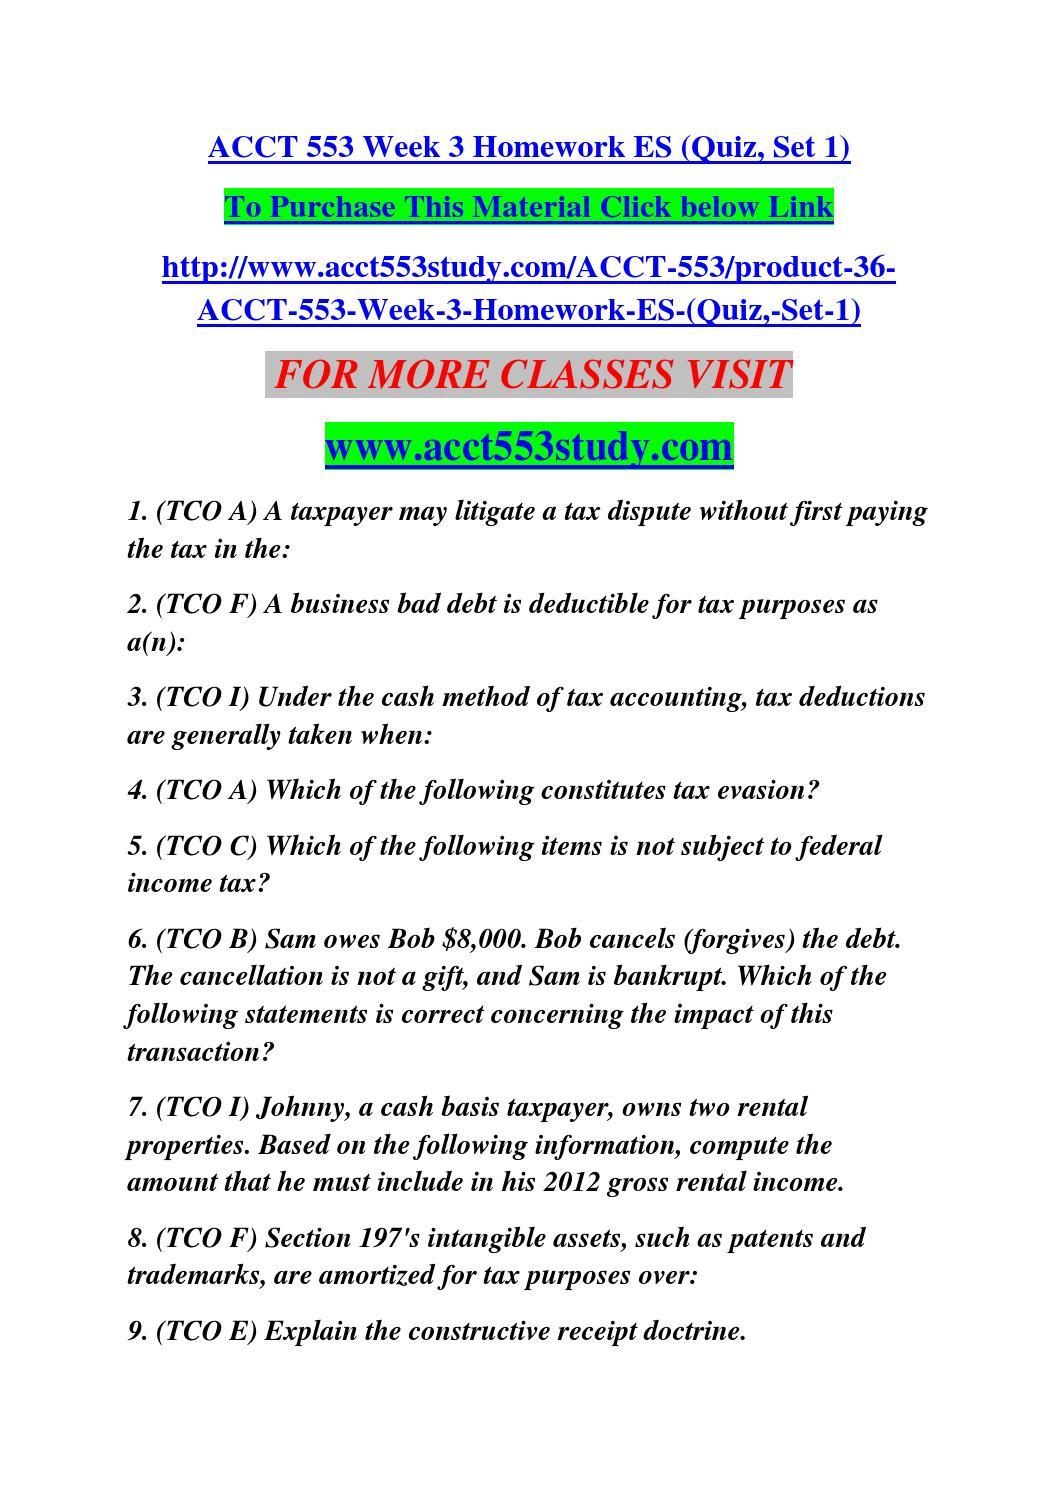 acct 553 week 3 homework es quiz set 1 by manu23 issuu